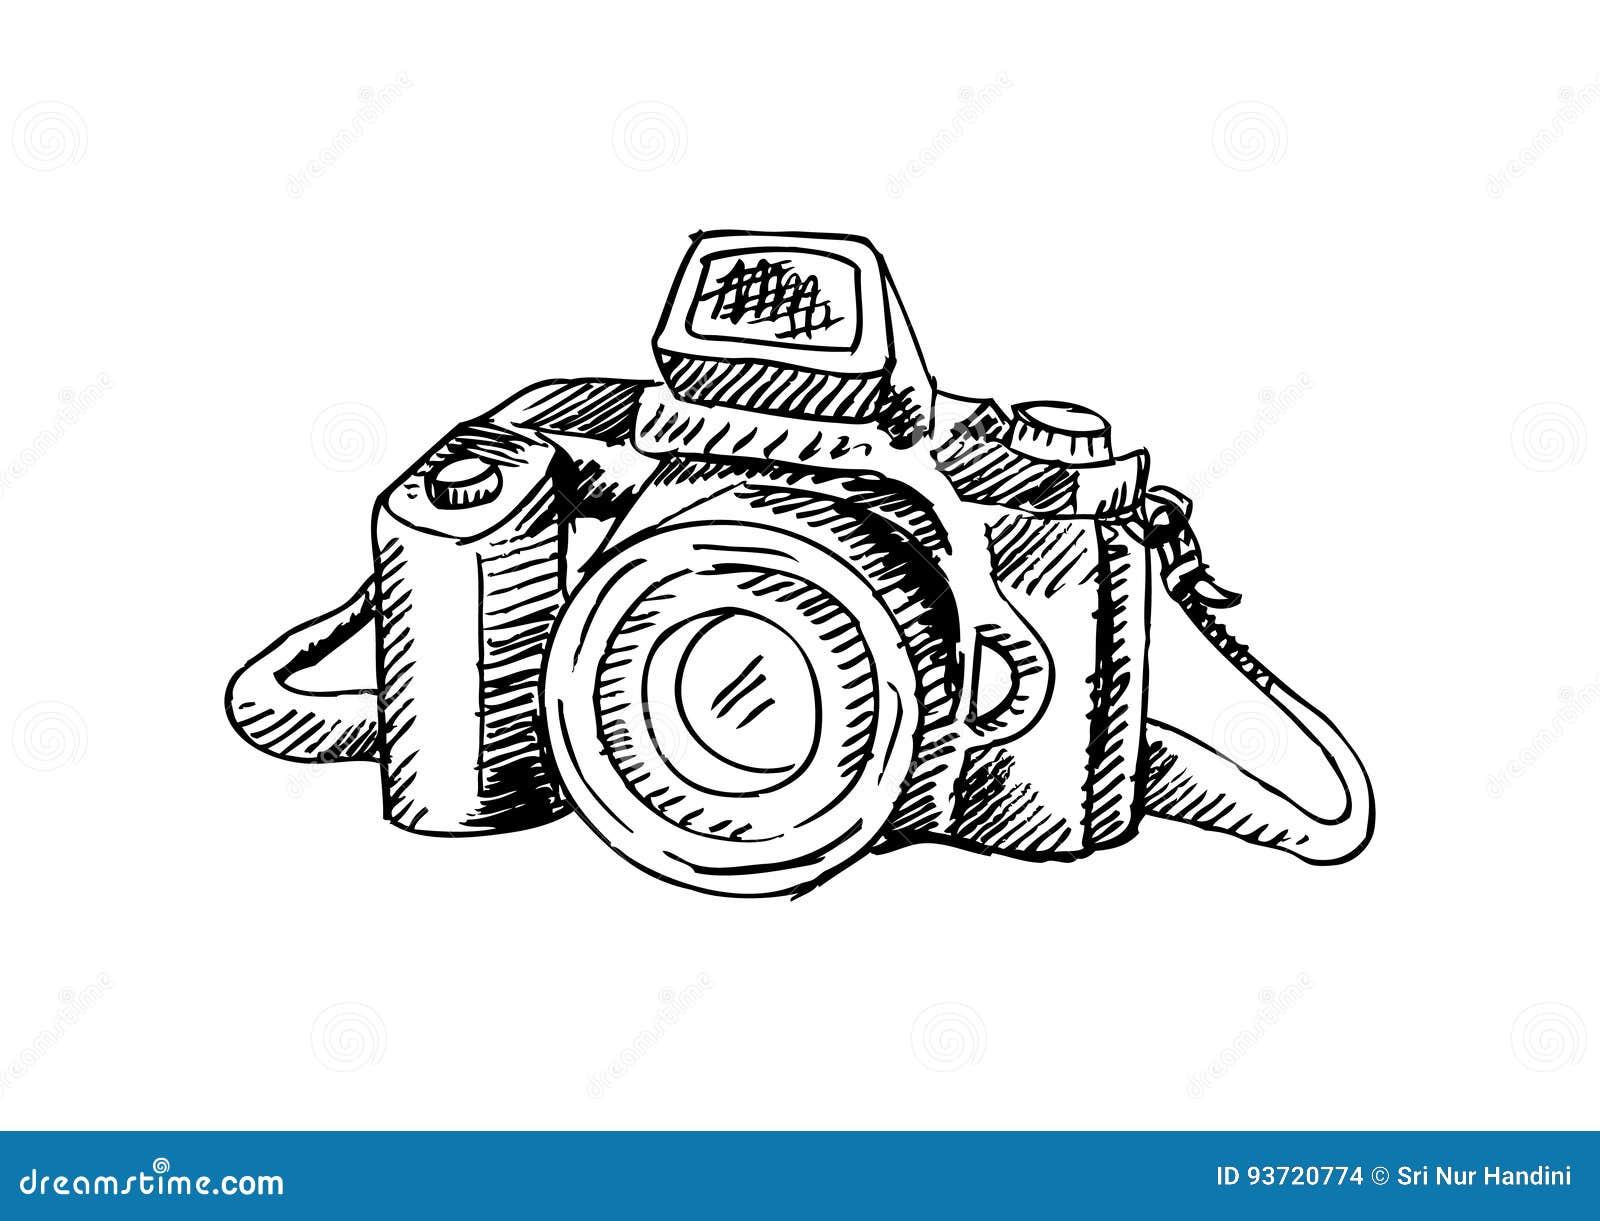 Retro Appareil Photo De Photo Illustration De Dessin De Main Illustration Stock Illustration Du Retro Dessin 93720774